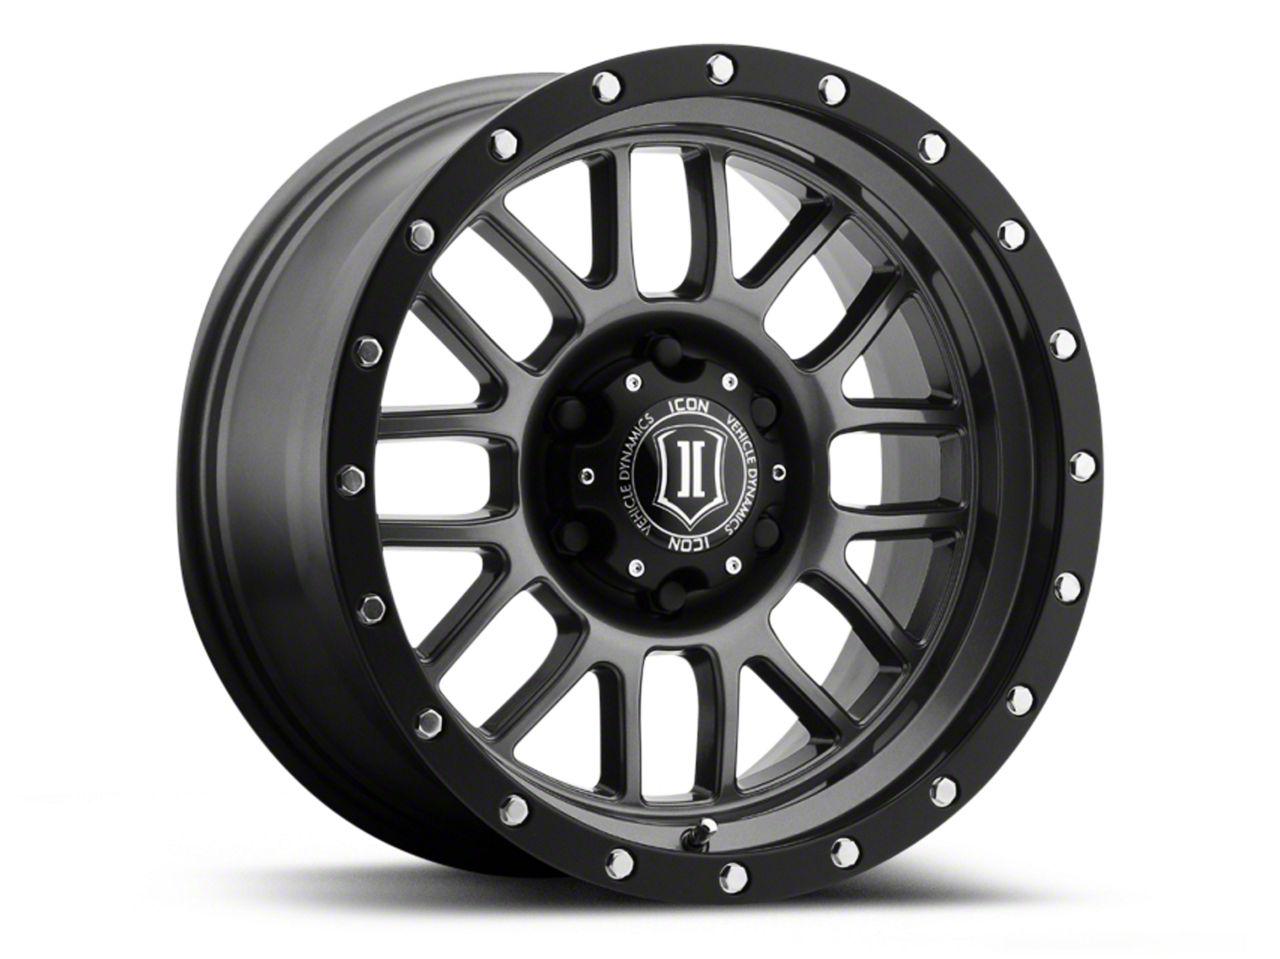 ICON Vehicle Dynamics Alpha Gunmetal Wheel - 17x8.5 (07-18 Jeep Wrangler JK; 2018 Jeep Wrangler JL)